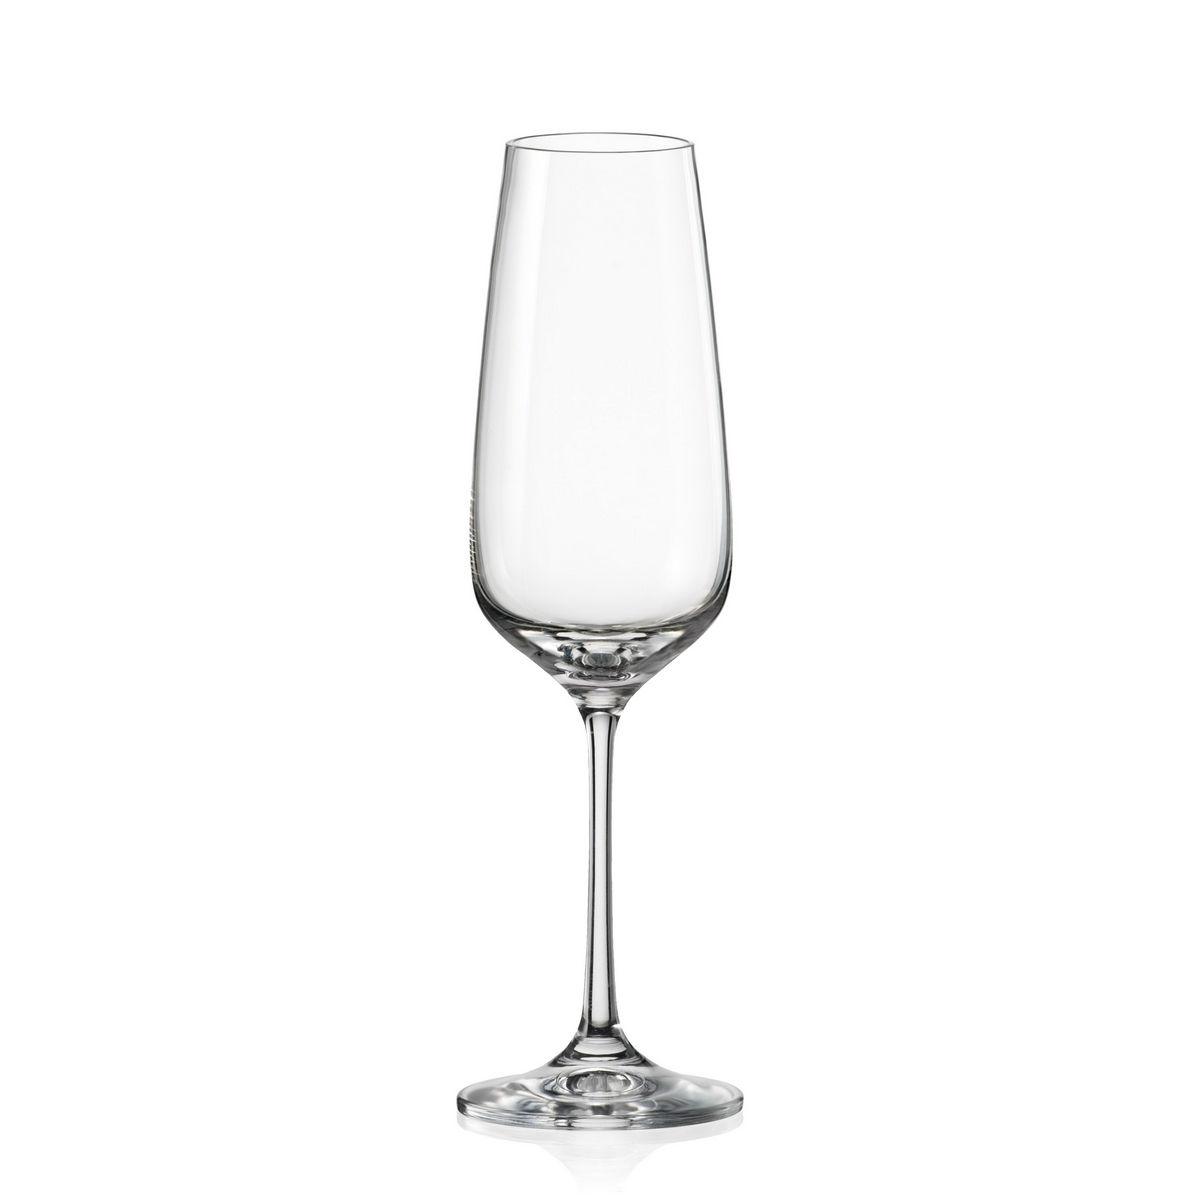 Giselle Set 6 Pahare Cristalin Sampanie 190 Ml 2021 aranjareamesei.ro